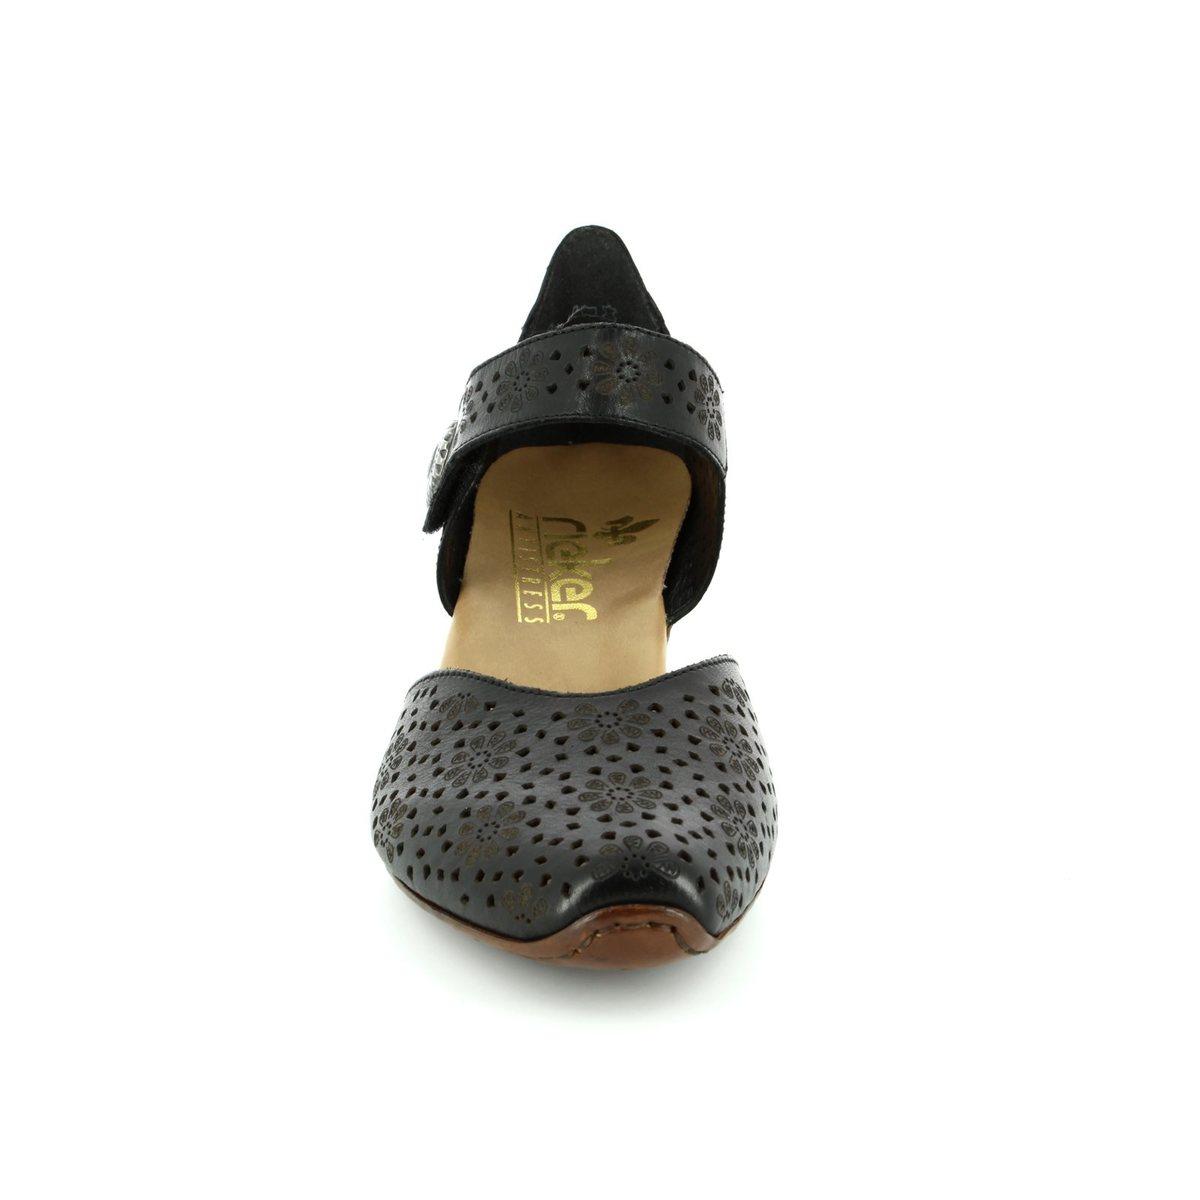 Comfort Shoes Rieker 00 Black 43711 34R5jqcAL